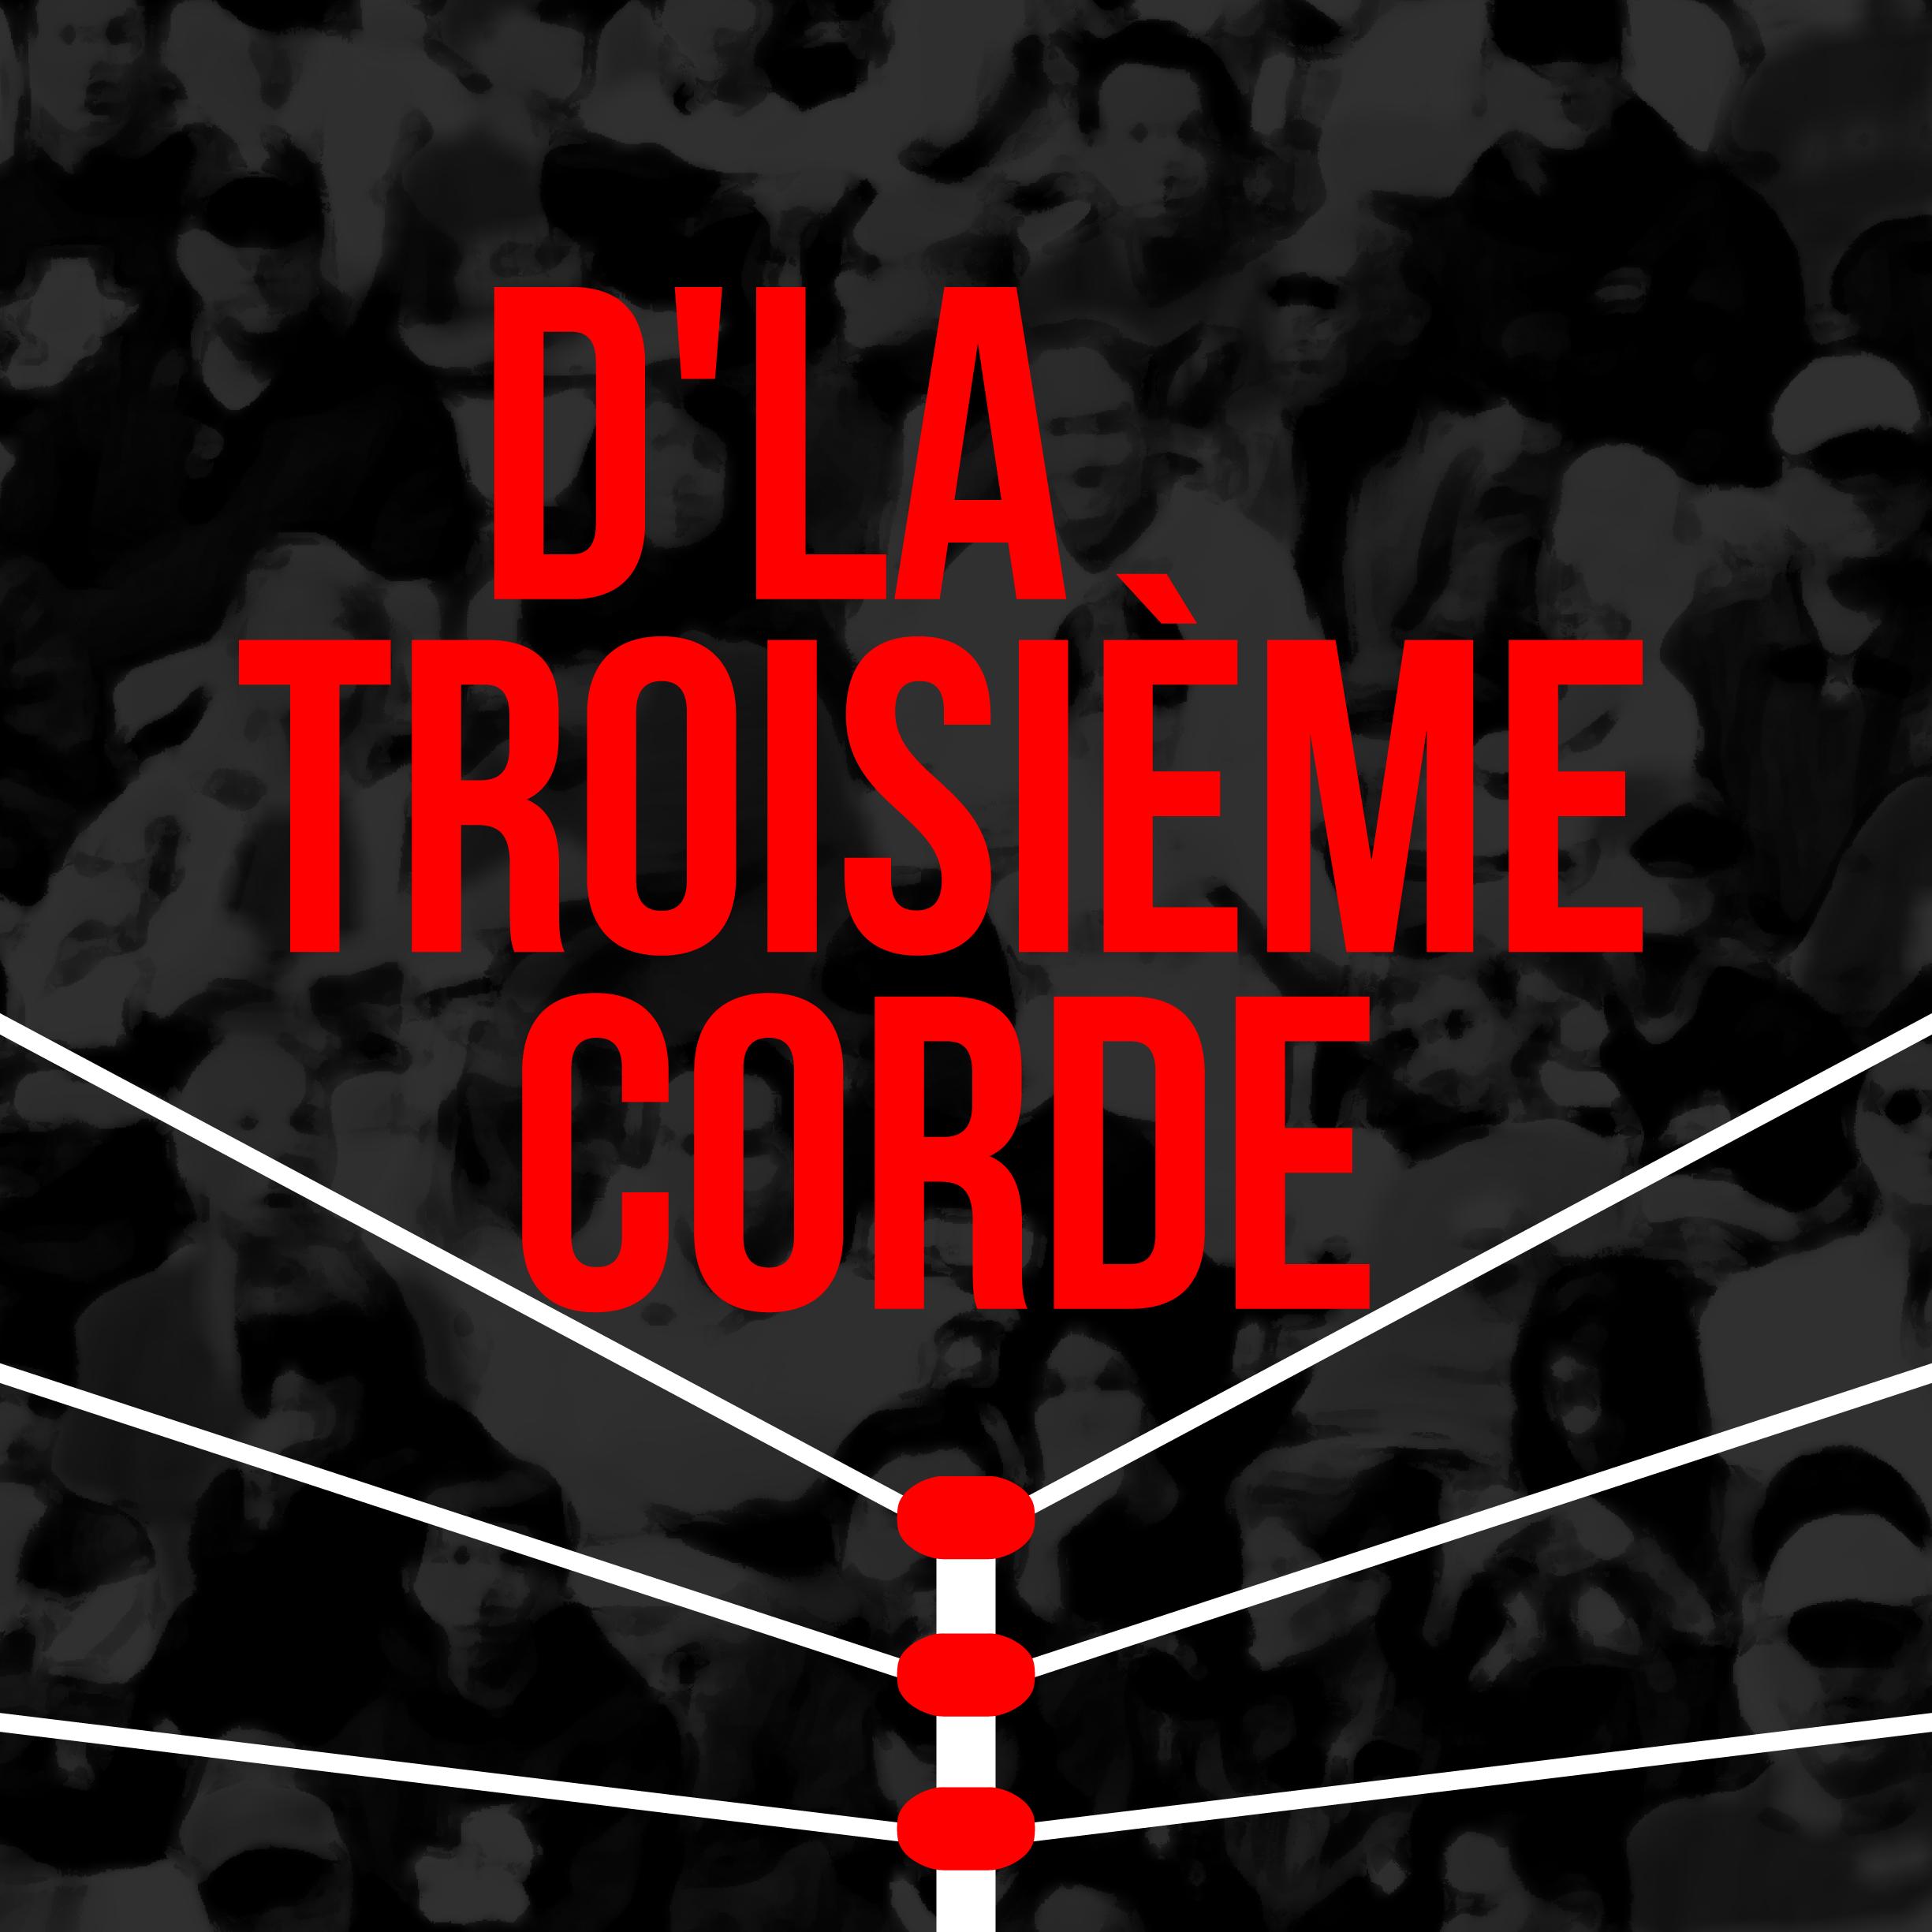 TroisiemeCorde_Profil_Facebook